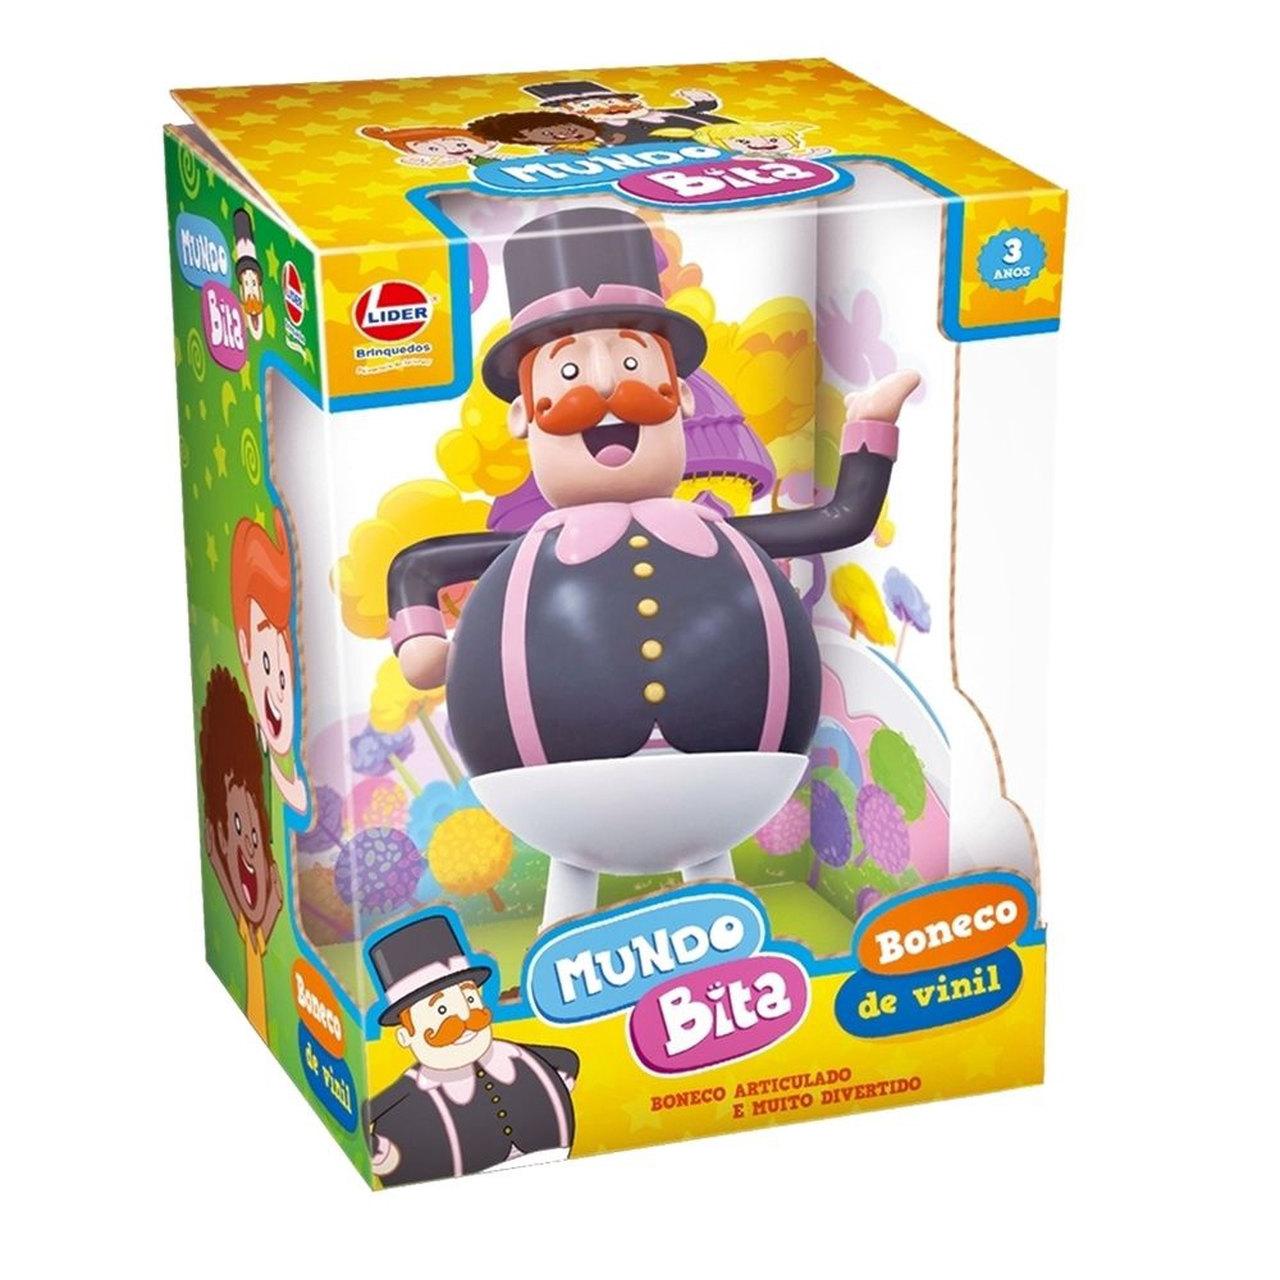 Boneco Mundo Bita Vinil Oficial Lider Brinquedos